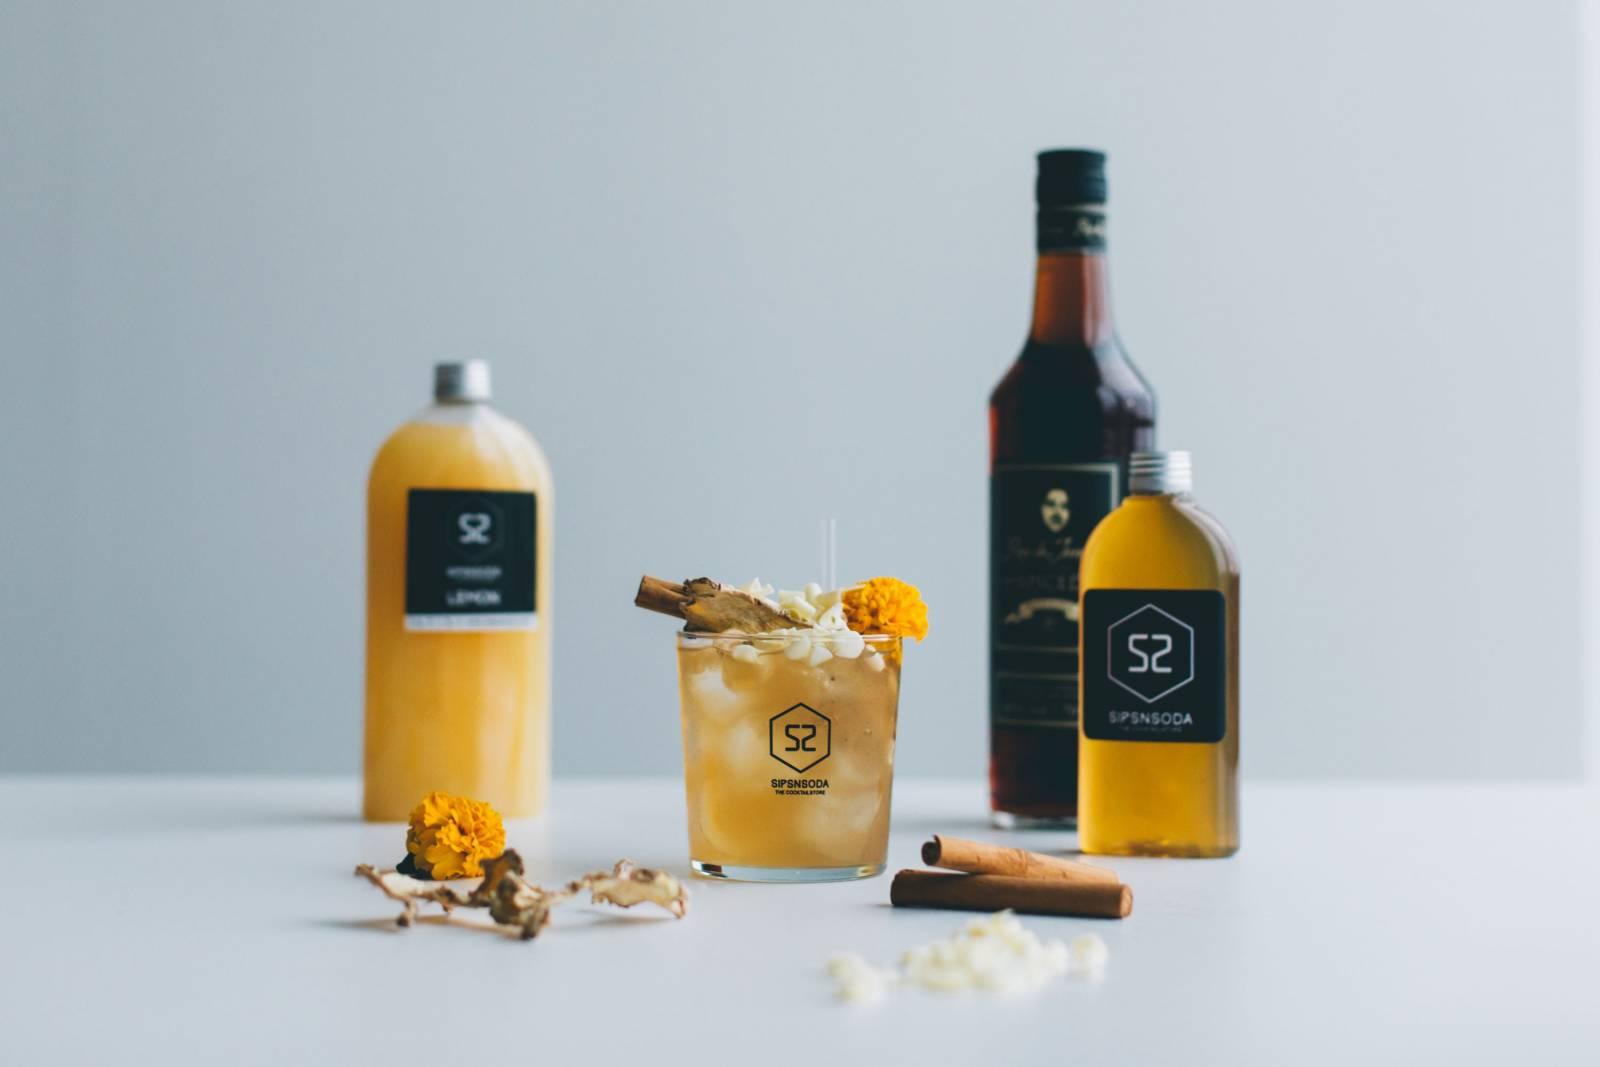 Sipsnsoda - Cocktails en mobiele bars - House of Weddings  - 23